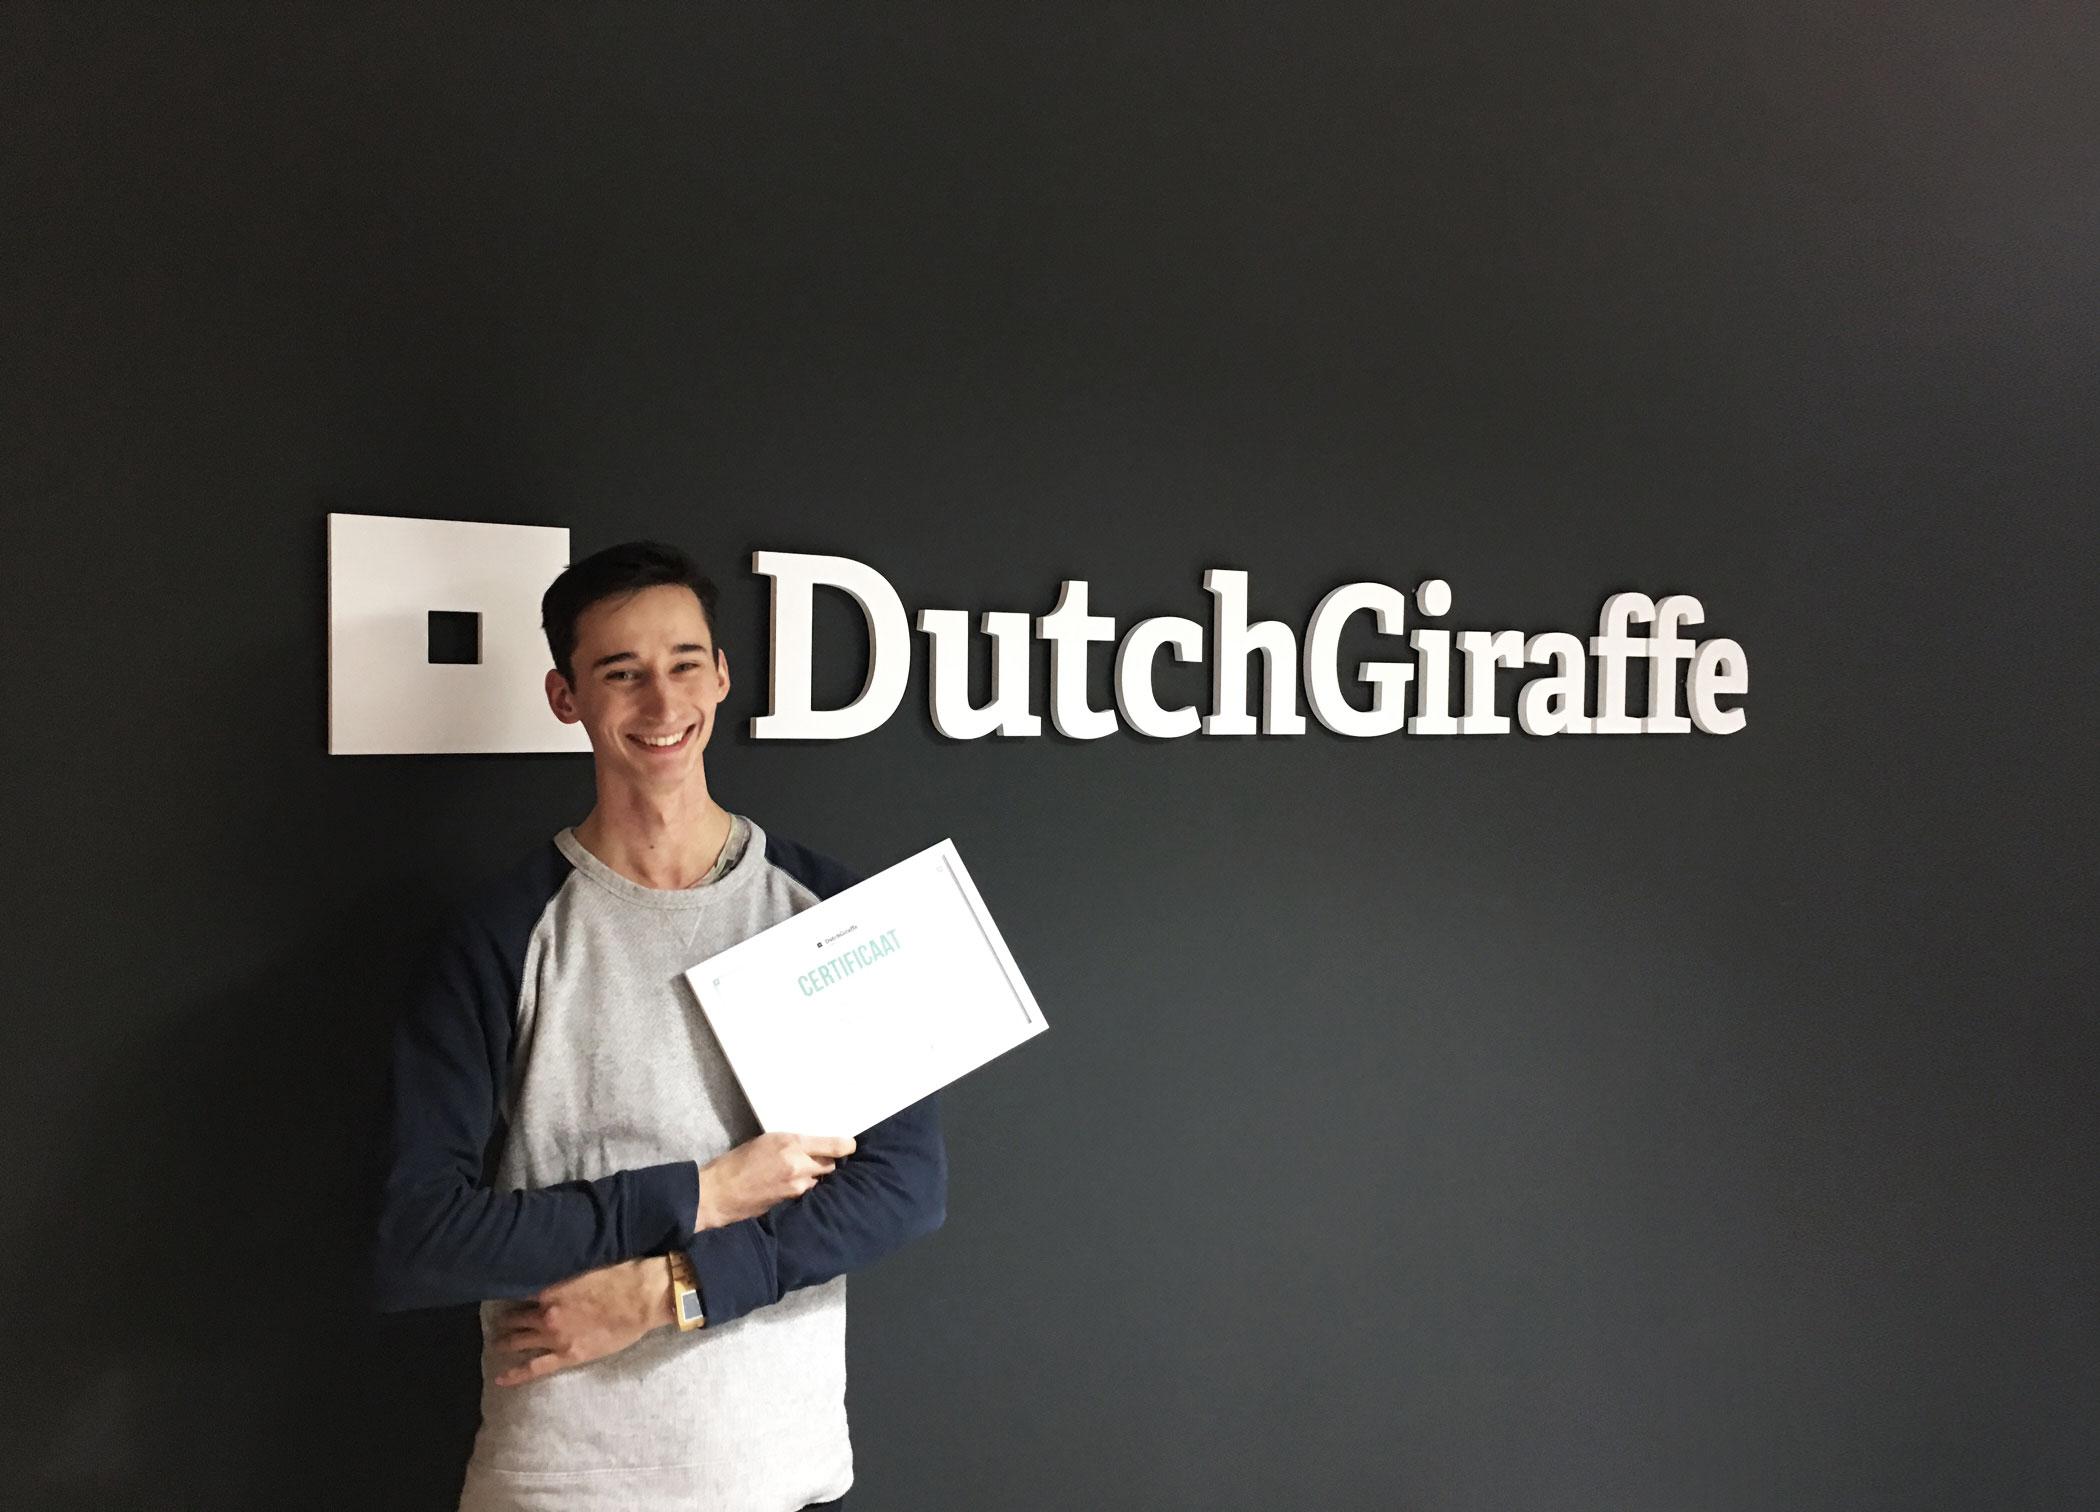 dutchgiraffe-academy-stagiair-certificaat